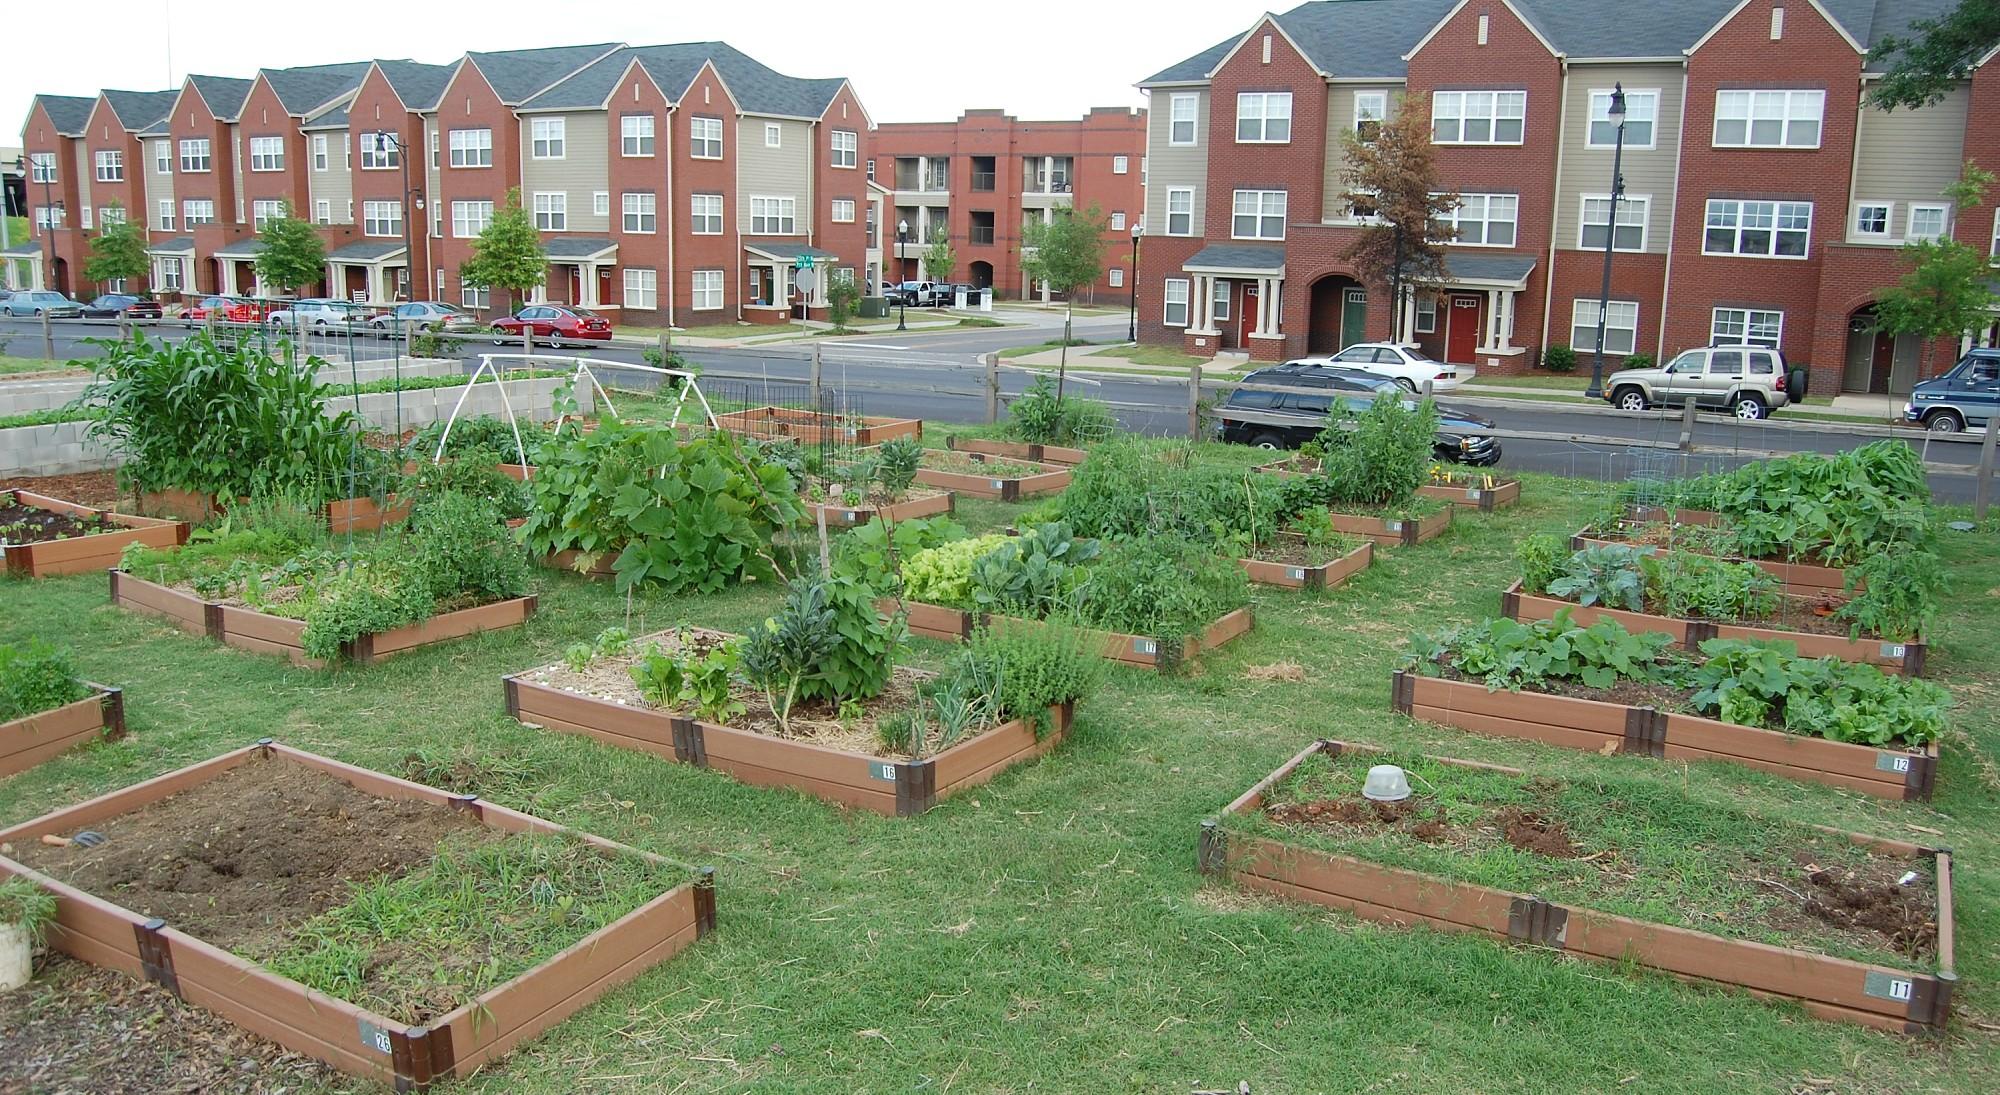 Jones Valley Urban Farm, community garden area with raised beds.